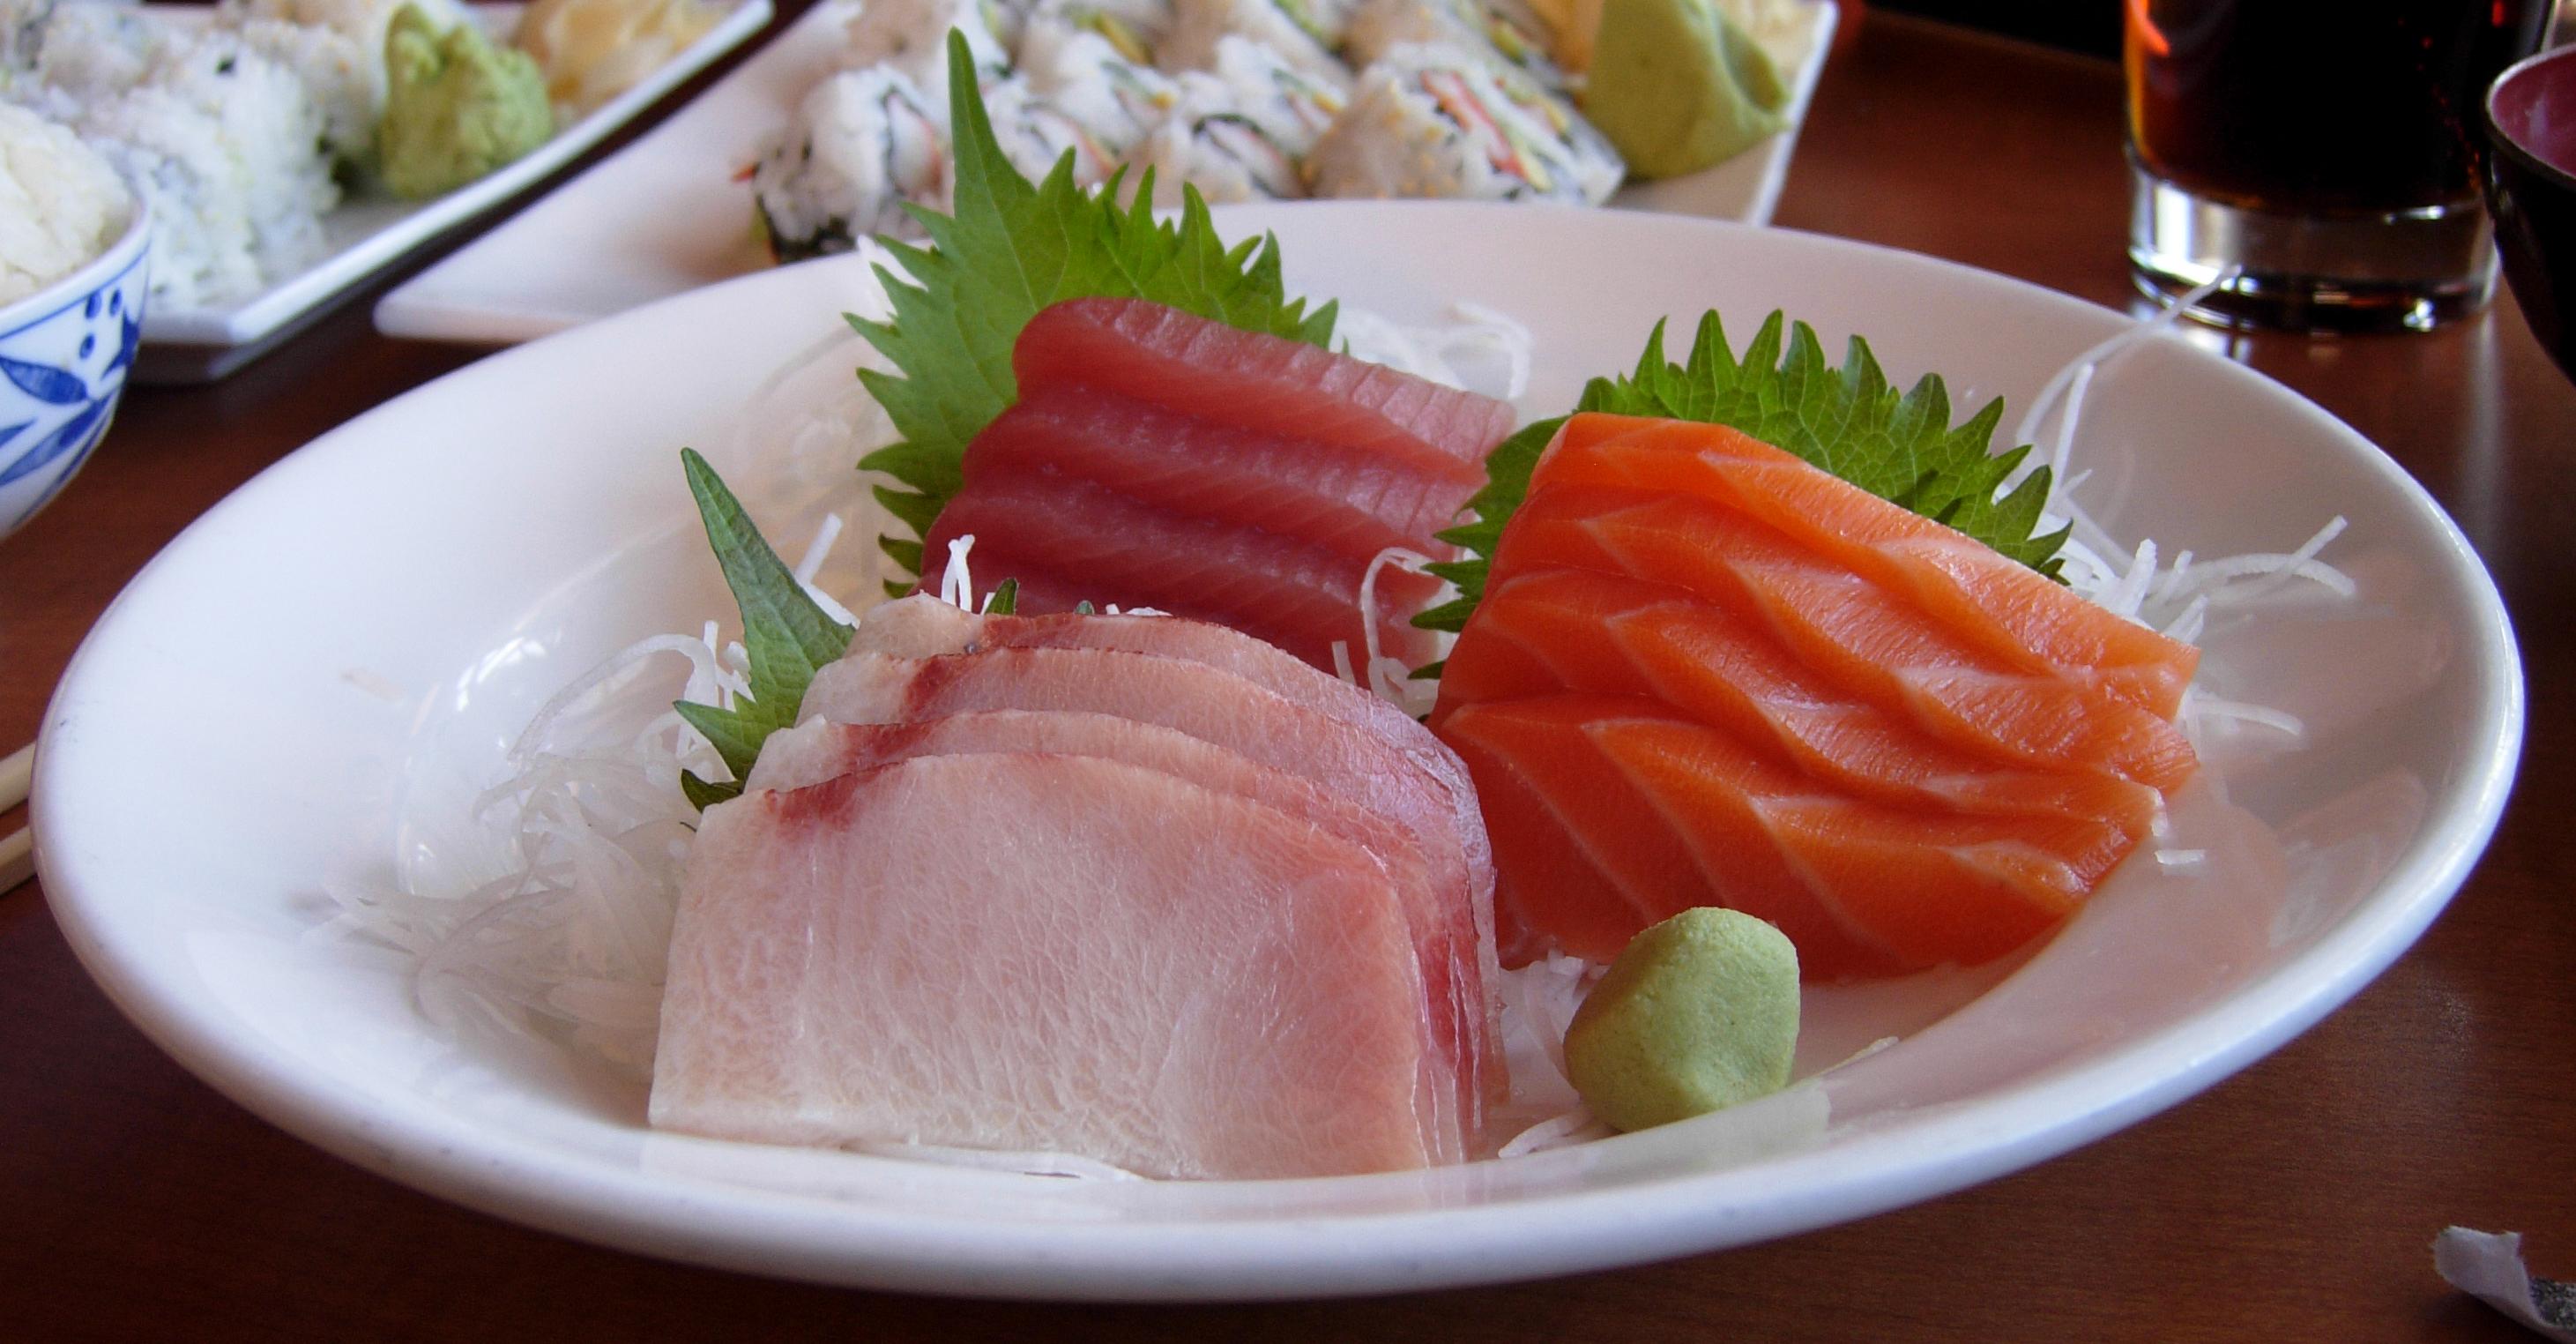 769 - sashimi by WolfC-Stock